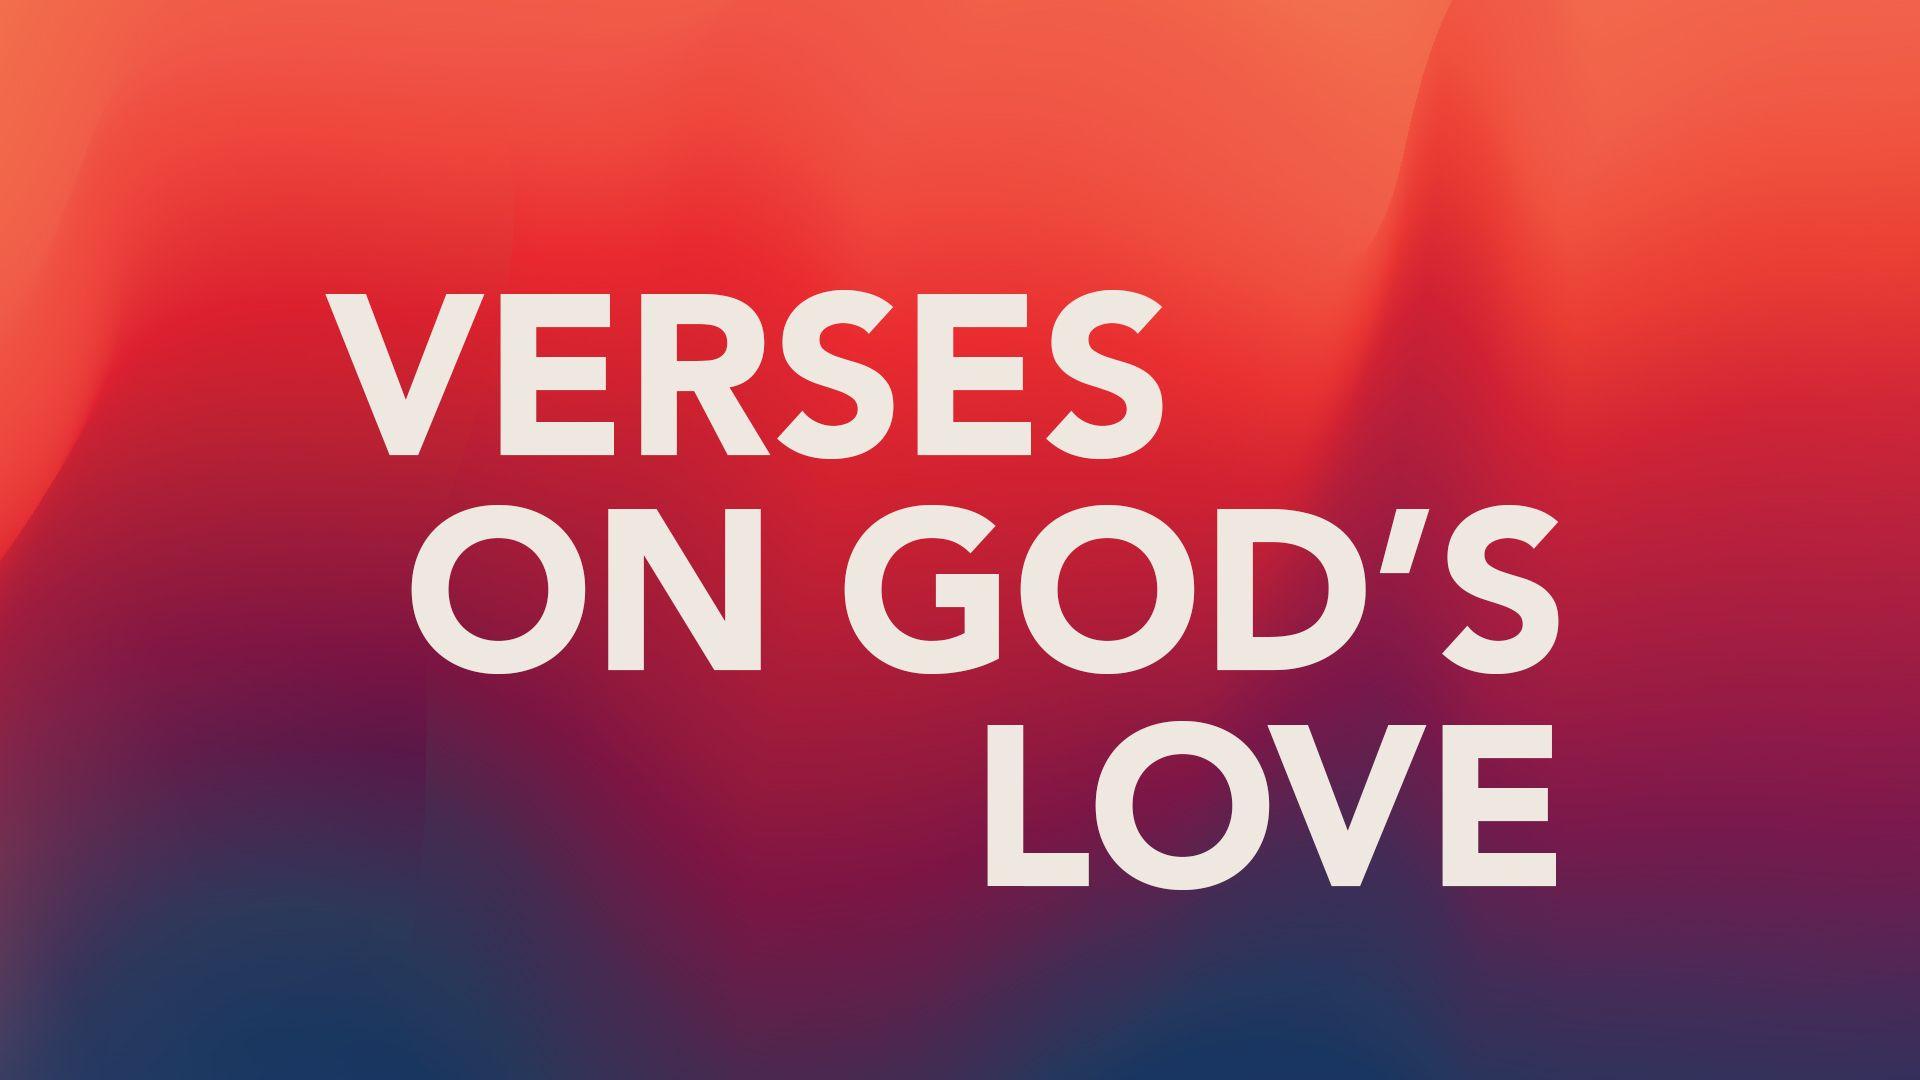 Remembering God's Love: 15 Verses to Help Hero Image